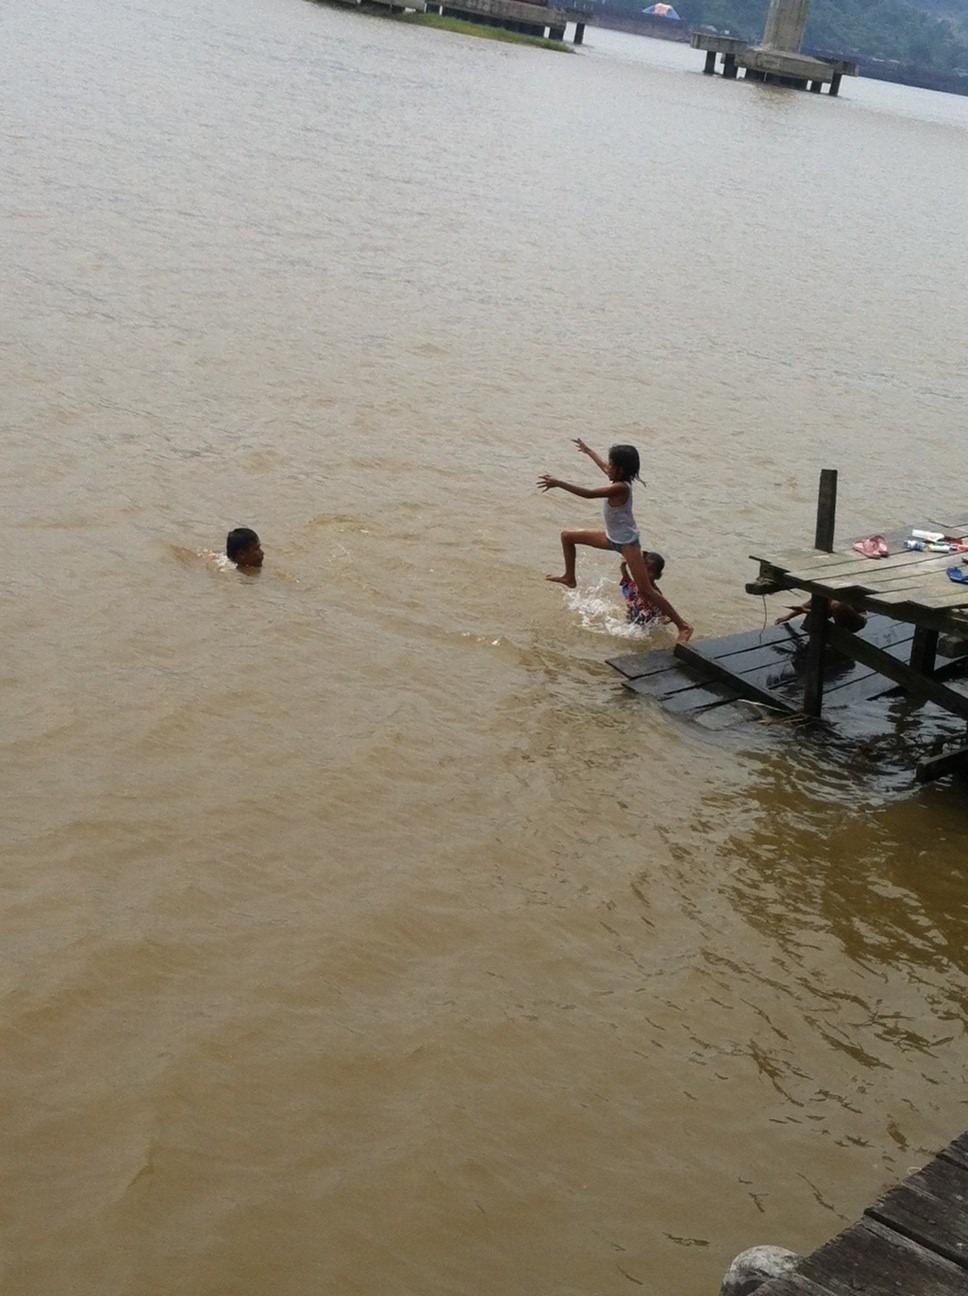 Keriaan di salah satu Batang, 24 September 2012 siang, antara dua anak-anak dan ayah mereka.